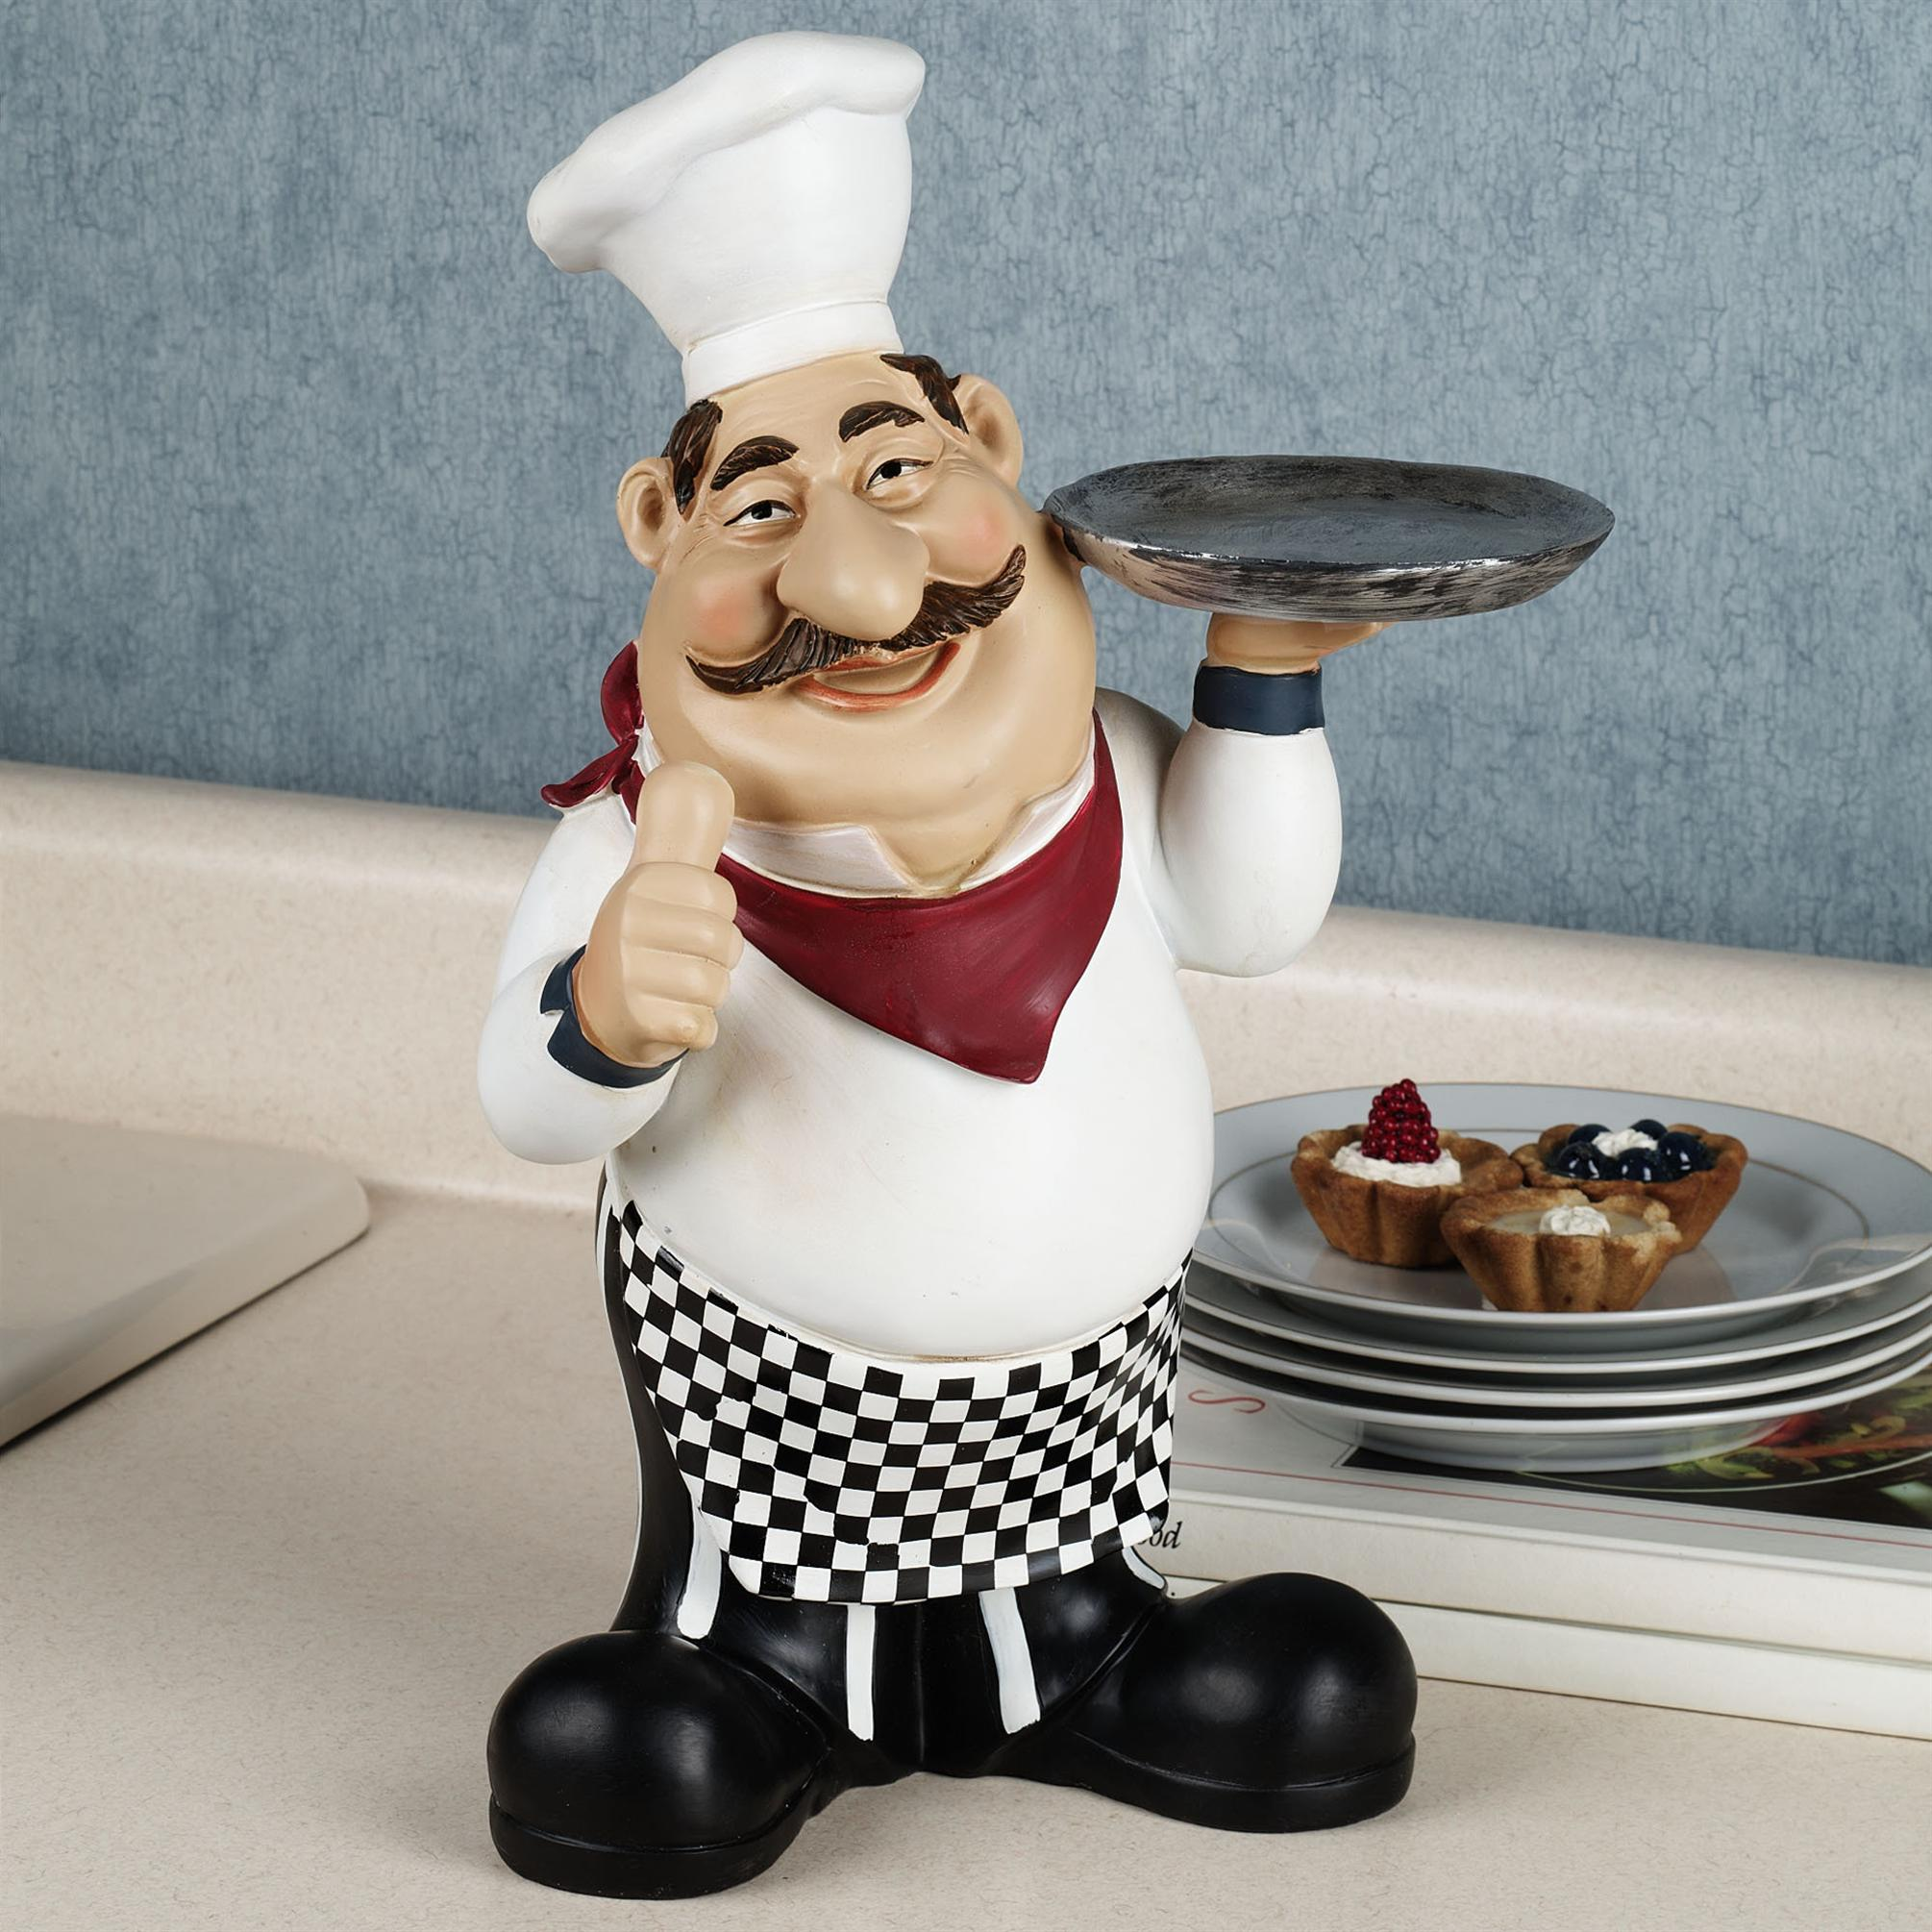 Fat Chef Kitchen Decor (View 6 of 11)